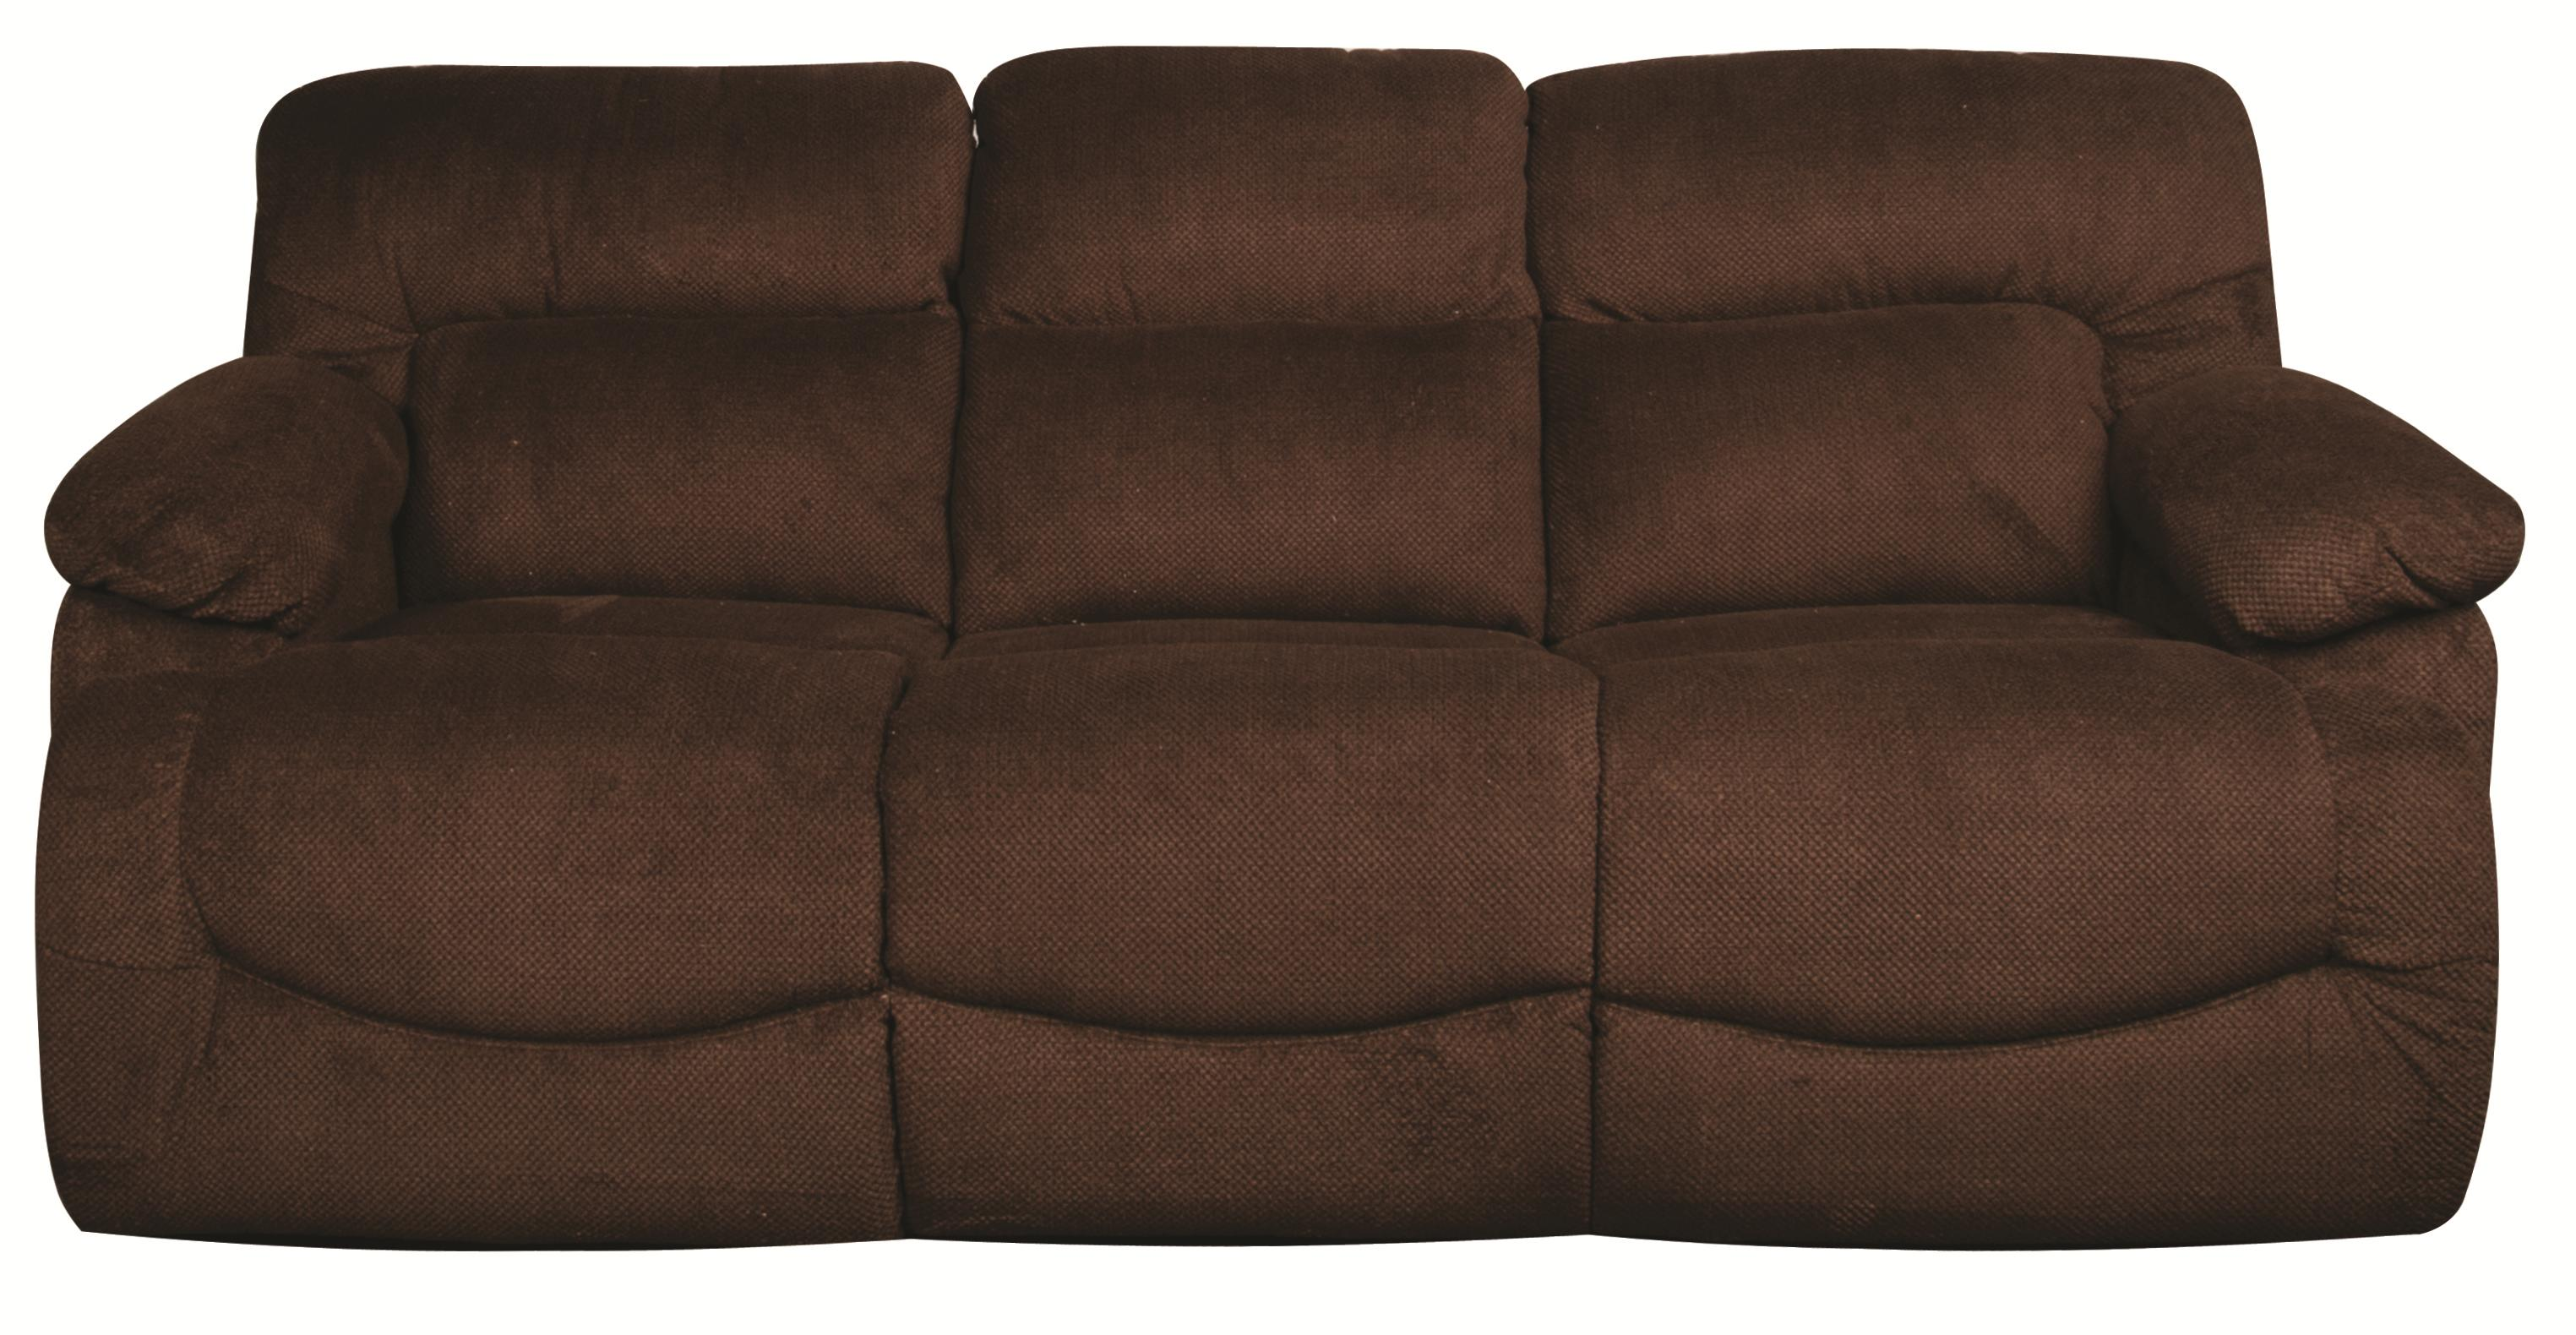 La-Z-Boy Asher Asher Power Reclining Sofa - Item Number: 102854234